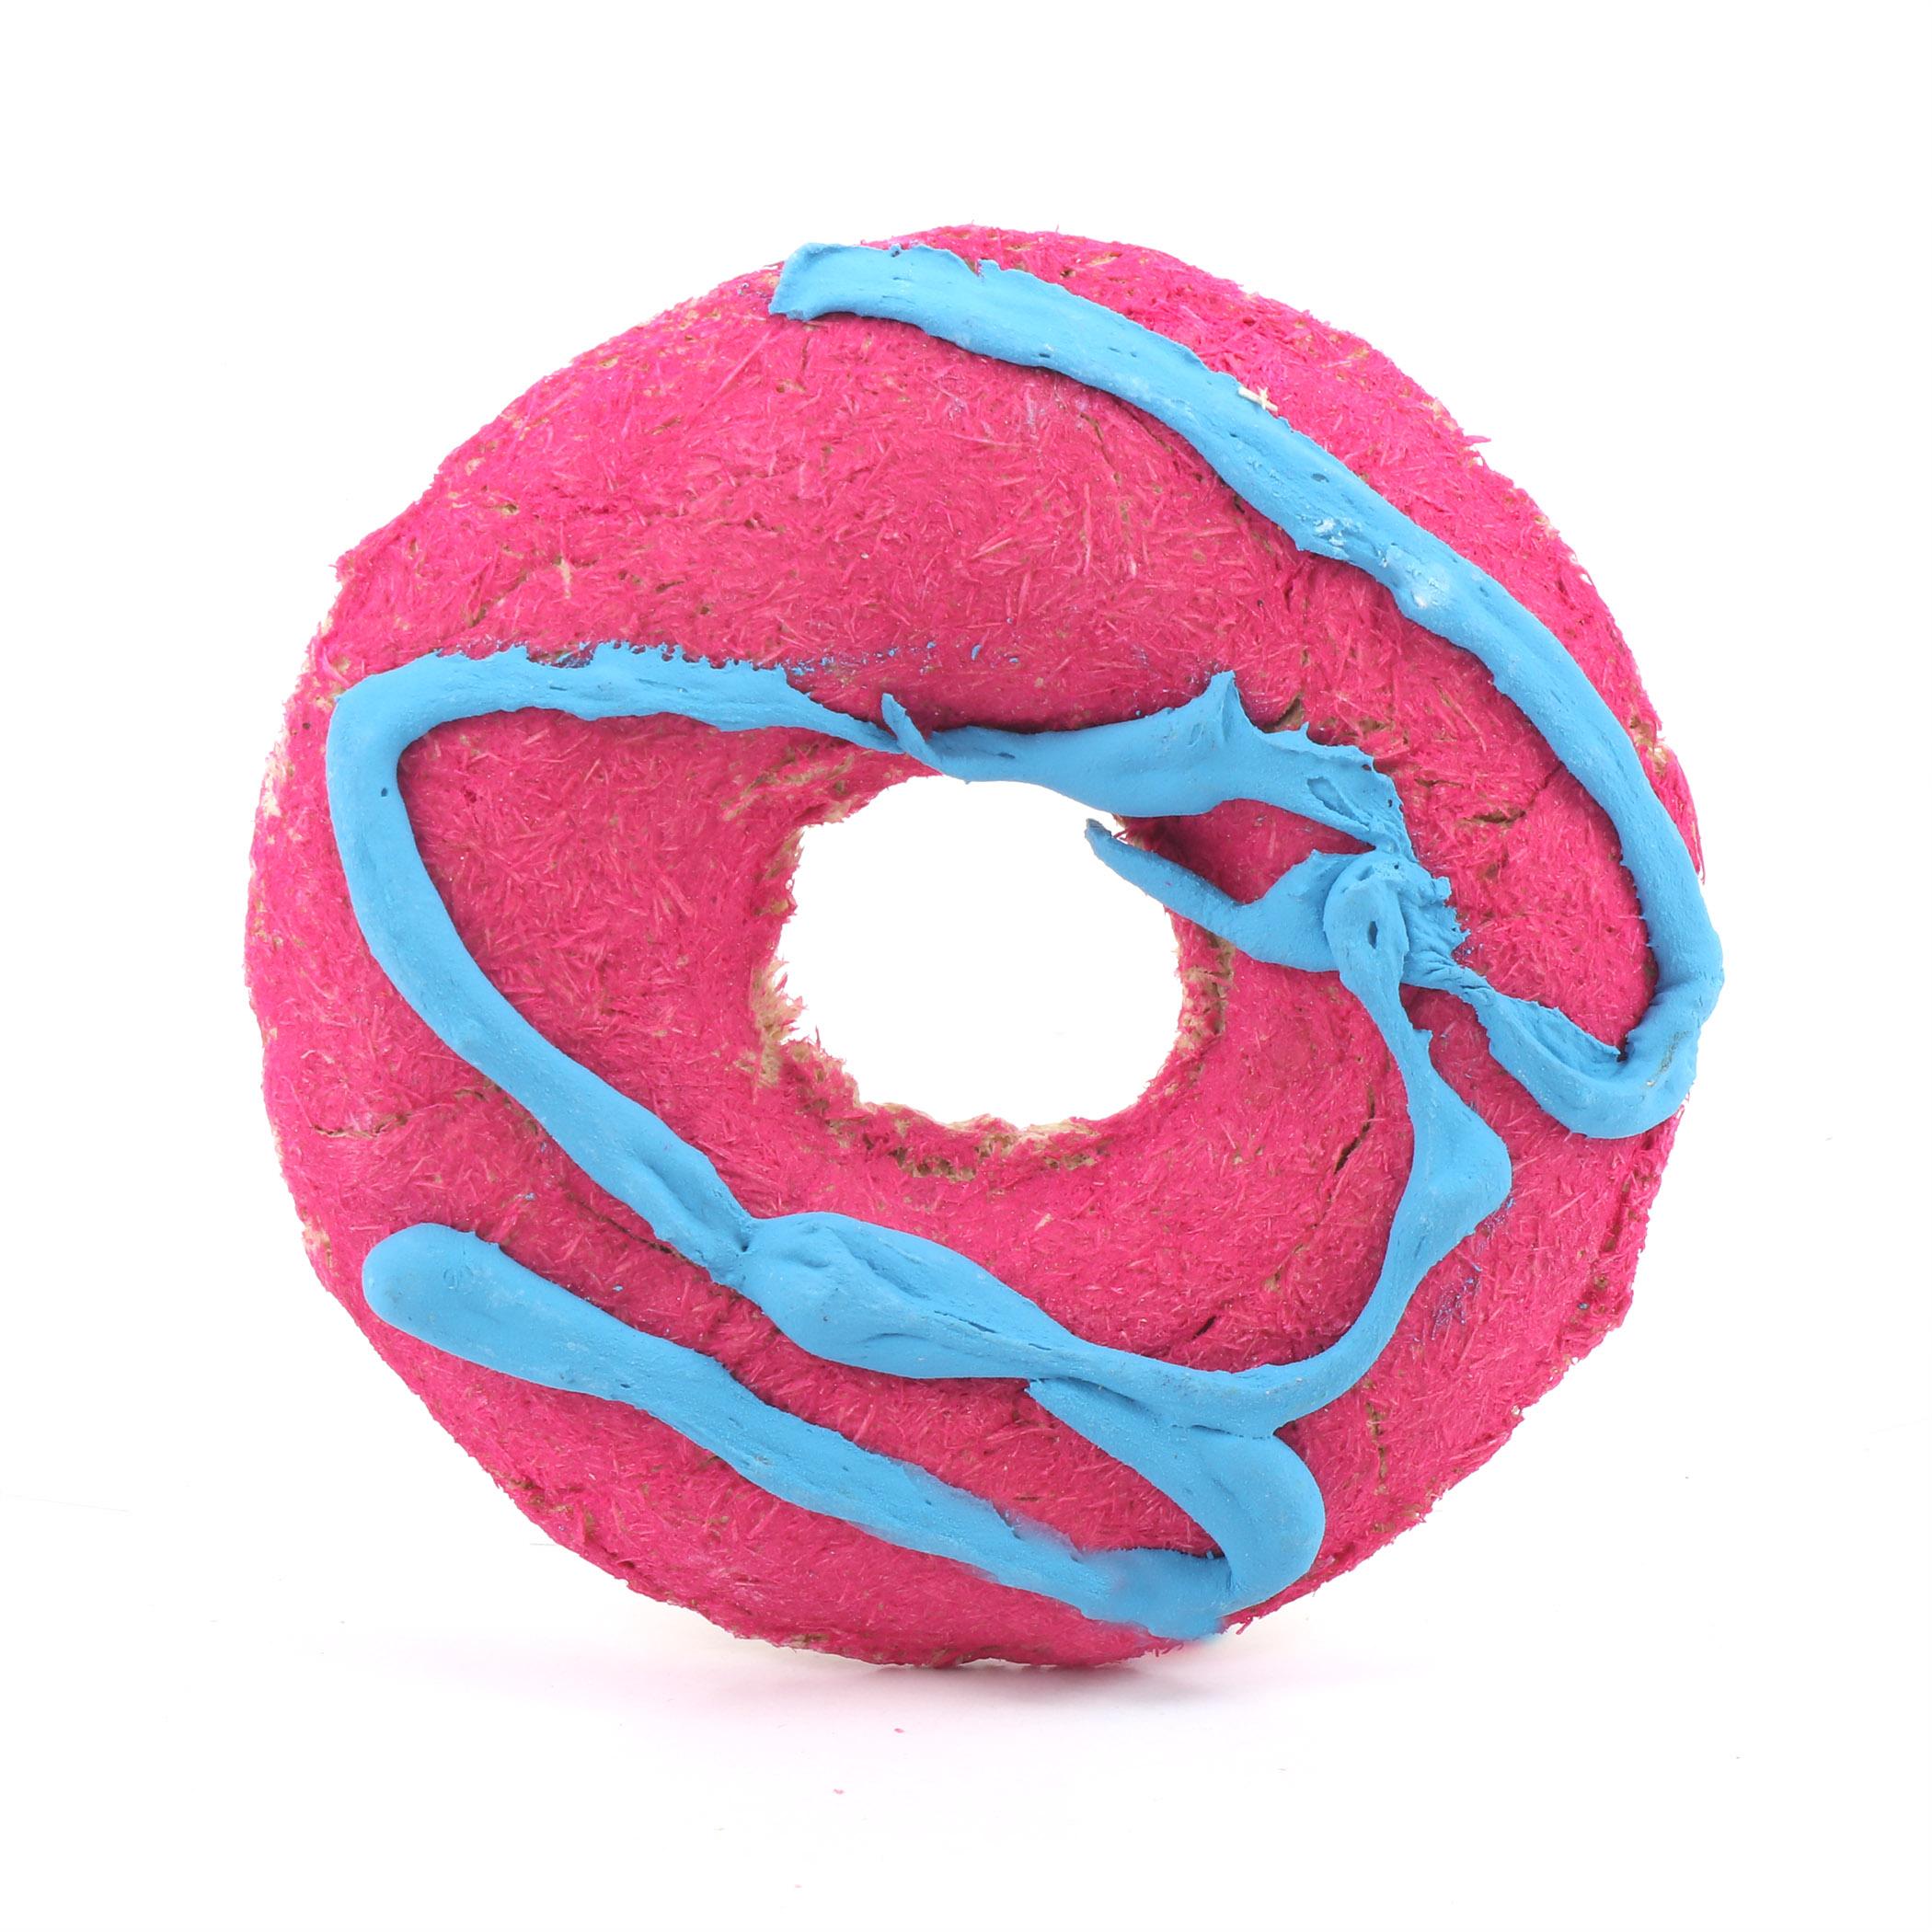 Krunchy Swirl Donut